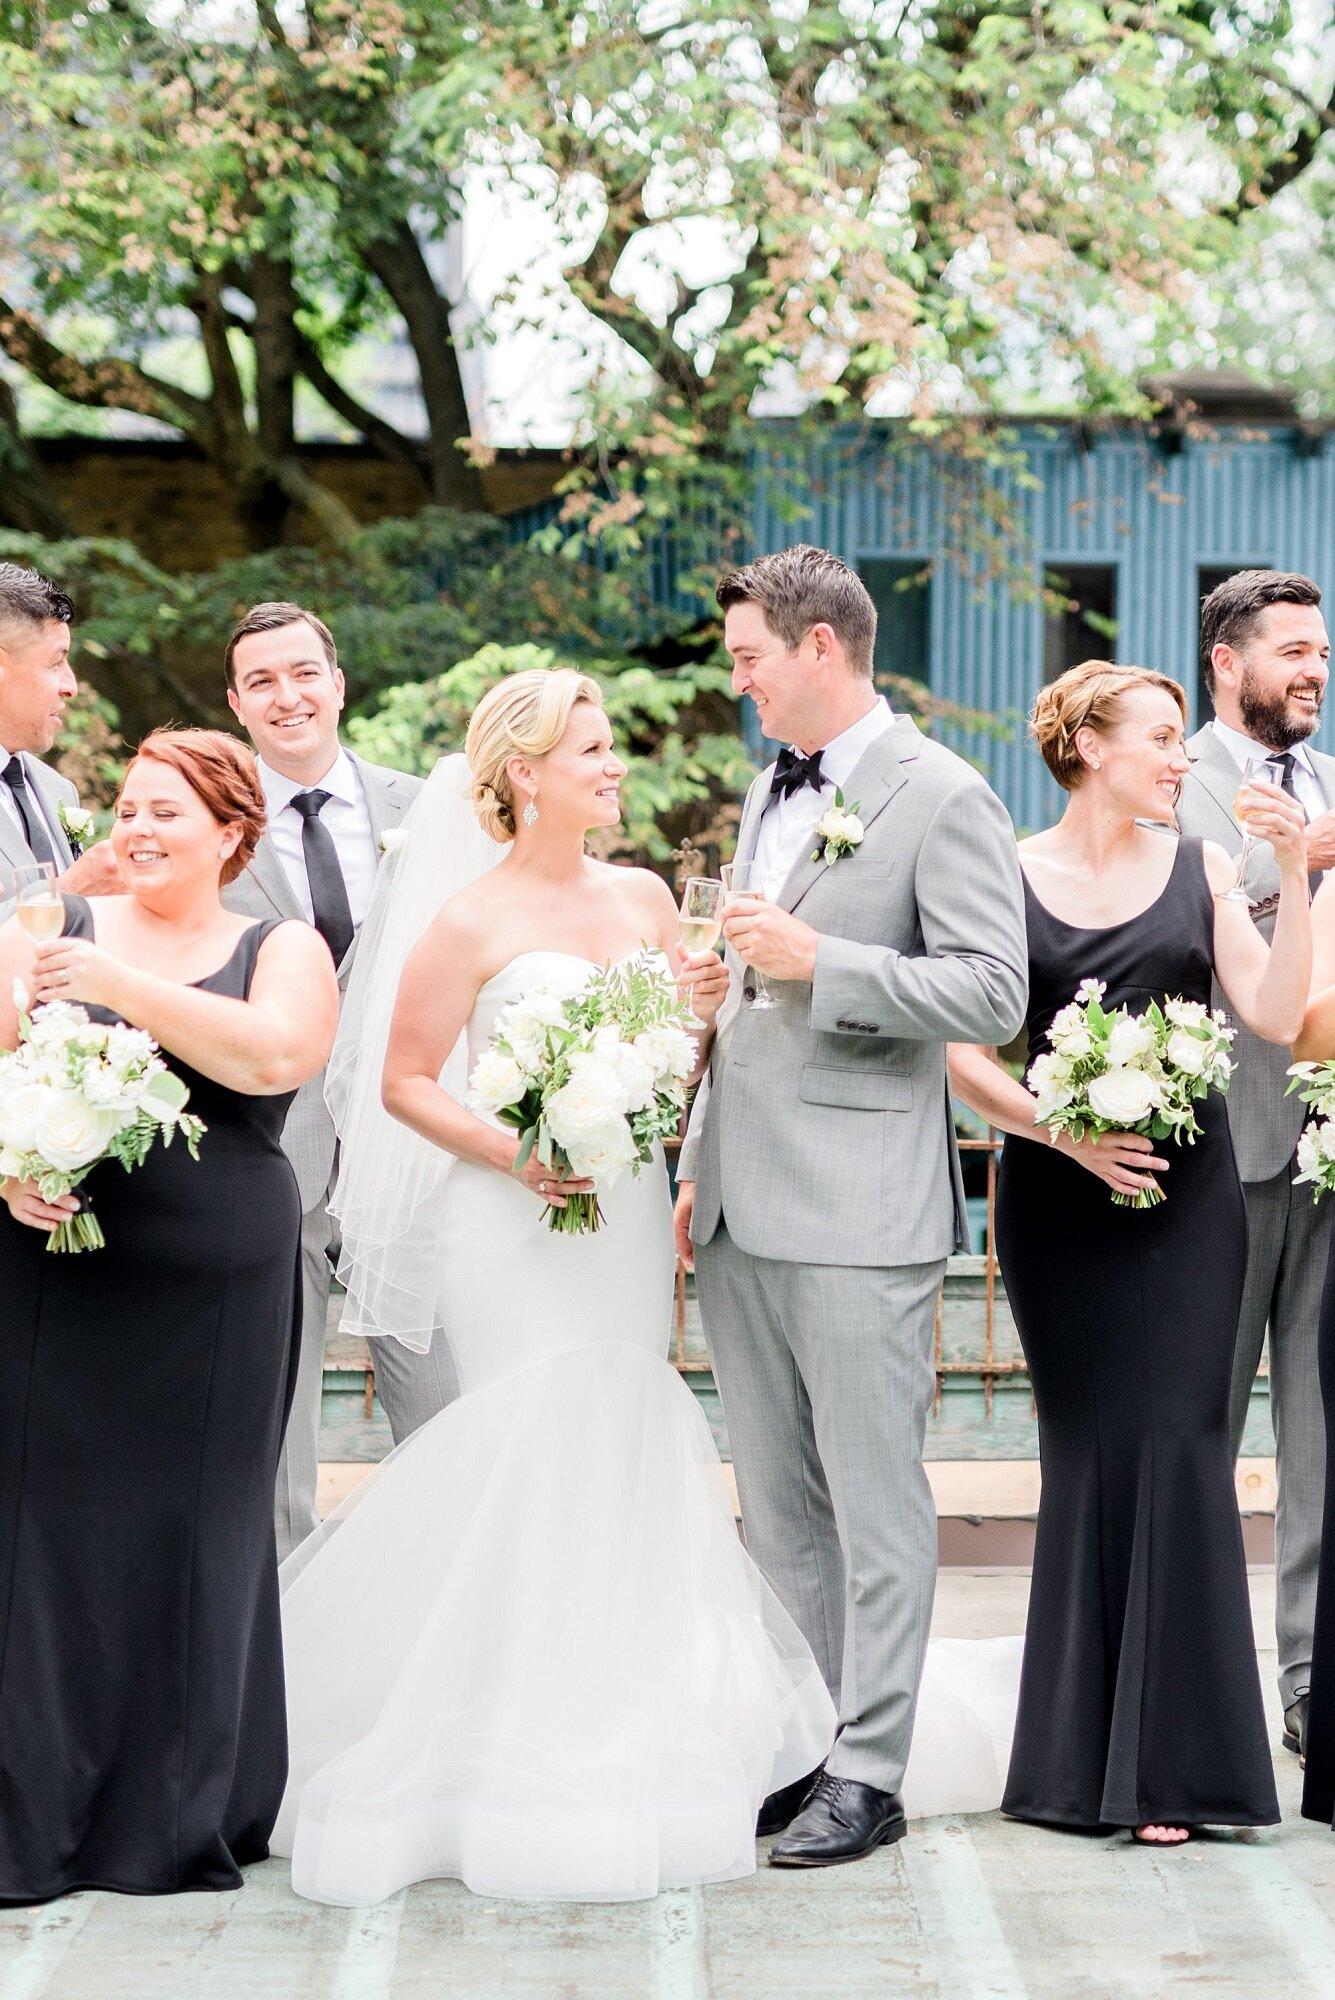 berkeley-field-house-wedding-kj-and-co-12.jpg